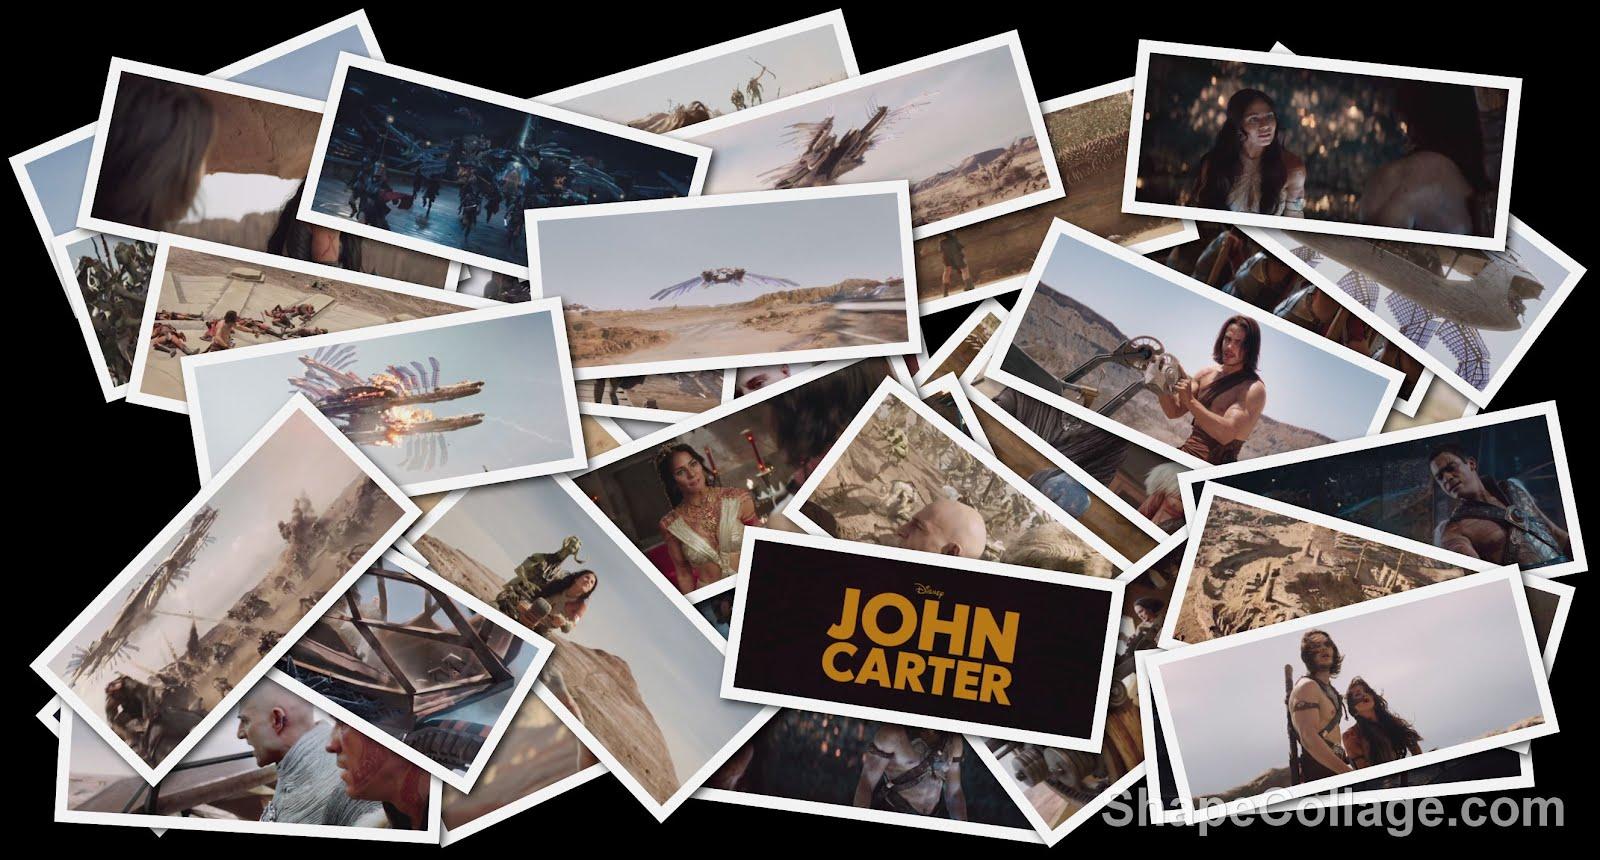 http://2.bp.blogspot.com/-1xR4qJLghC0/T4ADJC5PF2I/AAAAAAAAAGQ/RVqS9ukUnxE/s1600/John-Carter-01.jpg